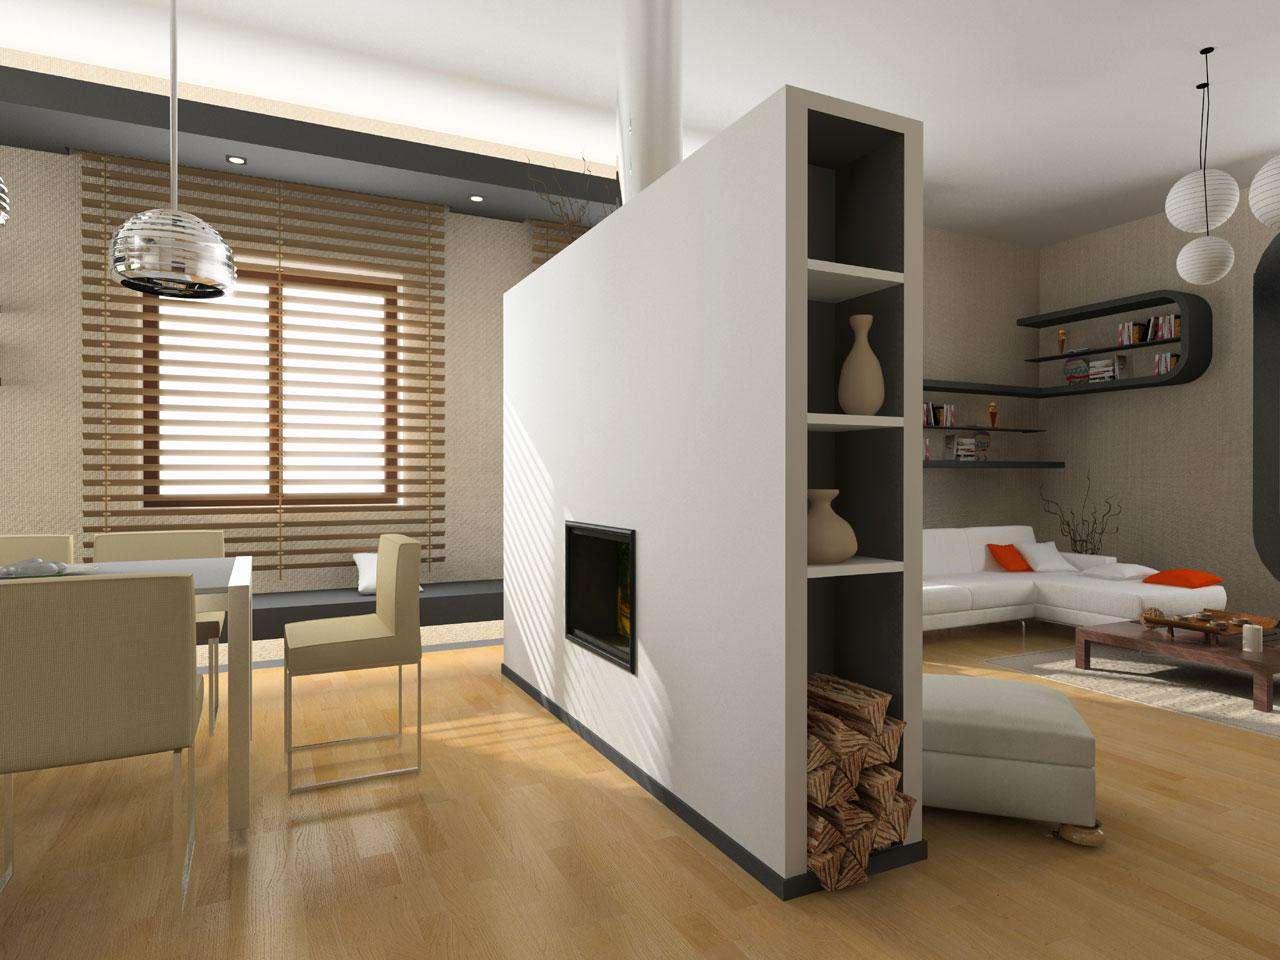 Buat Ruangan Lebih Luas Dengan Sekat Ruangan Minimalis